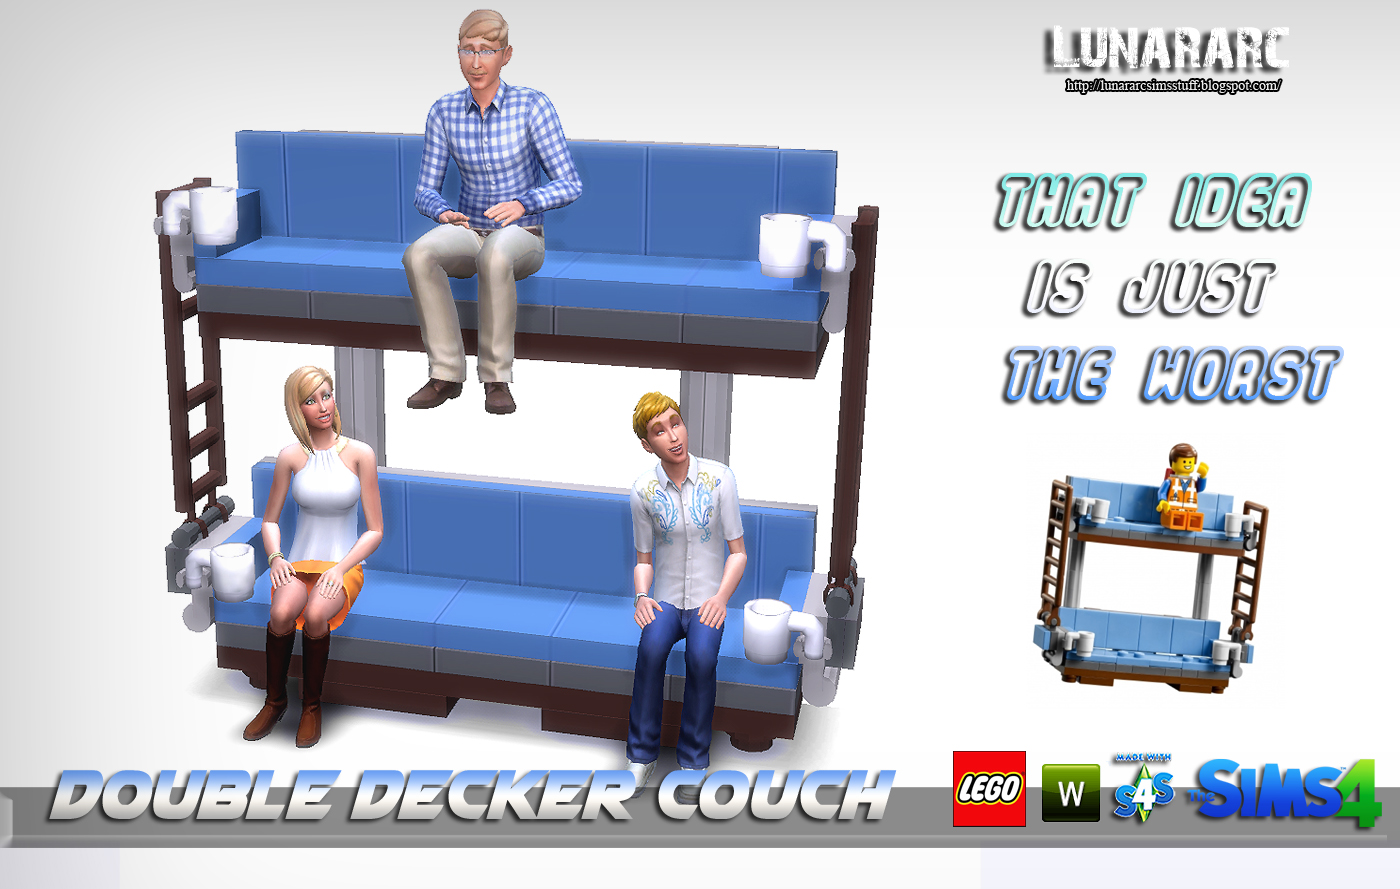 Lunararc Sims Double Decker Couch